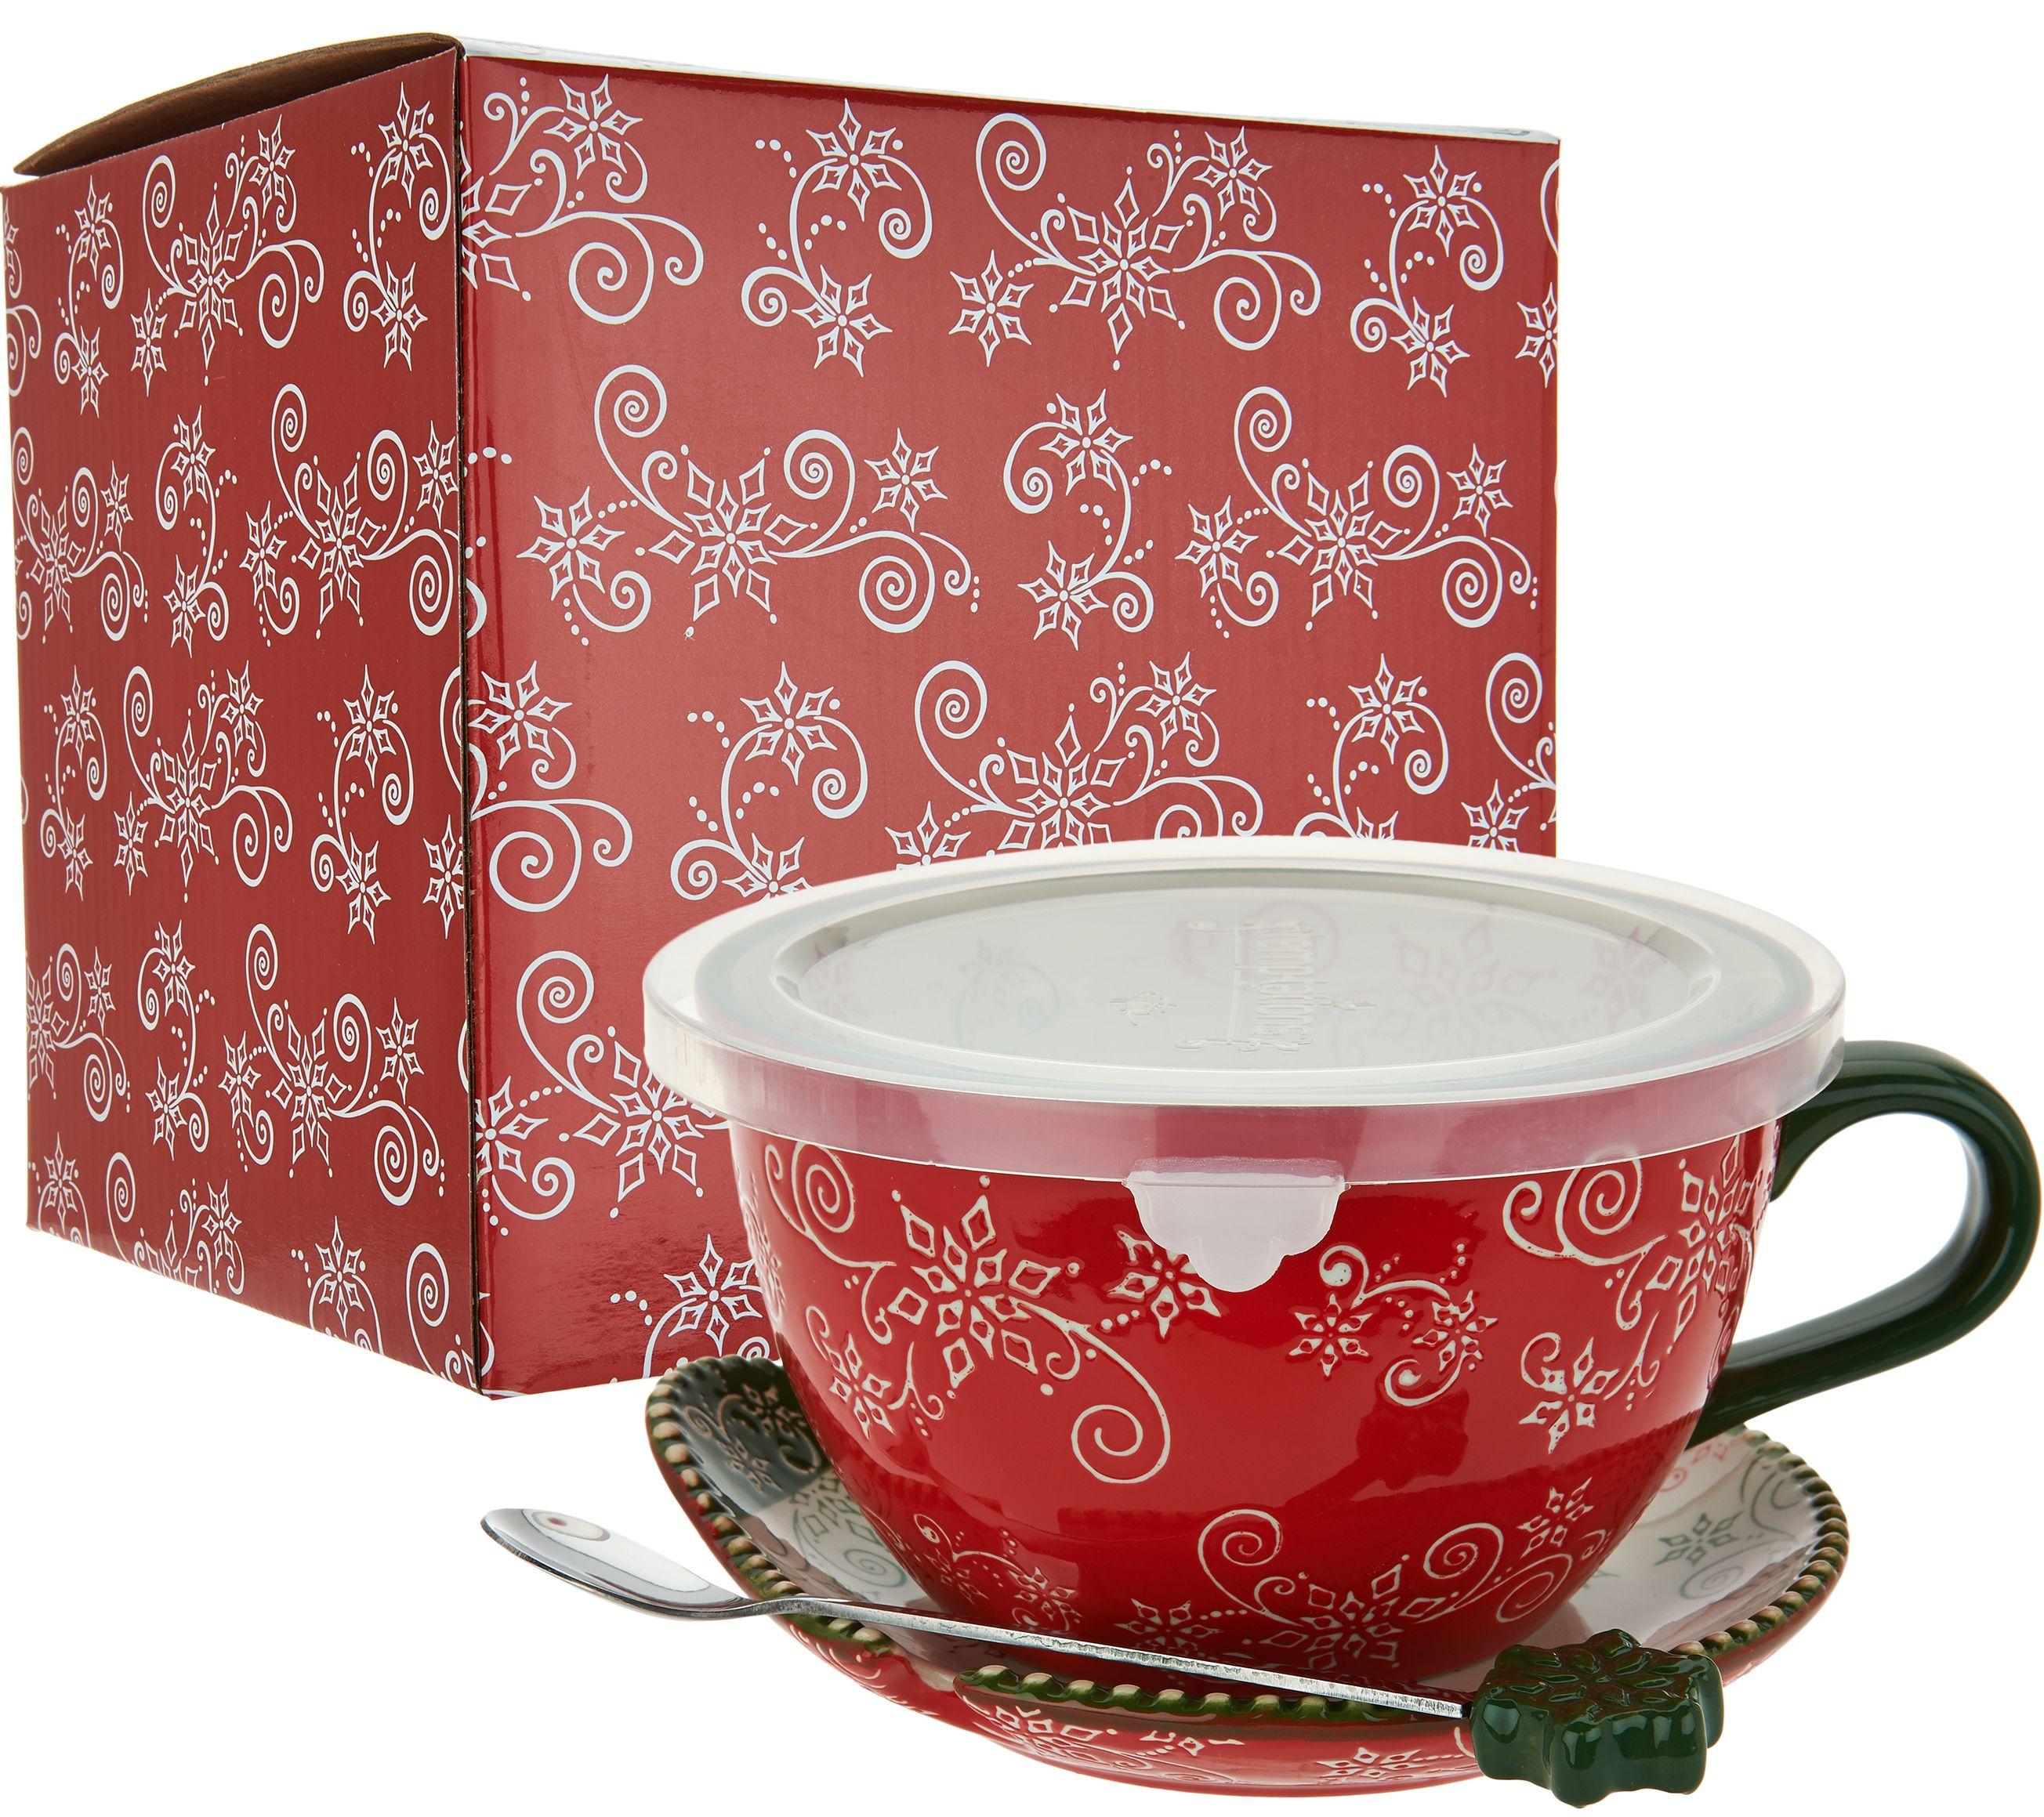 Soup Mug With Handle And Lid Best Mugs Design